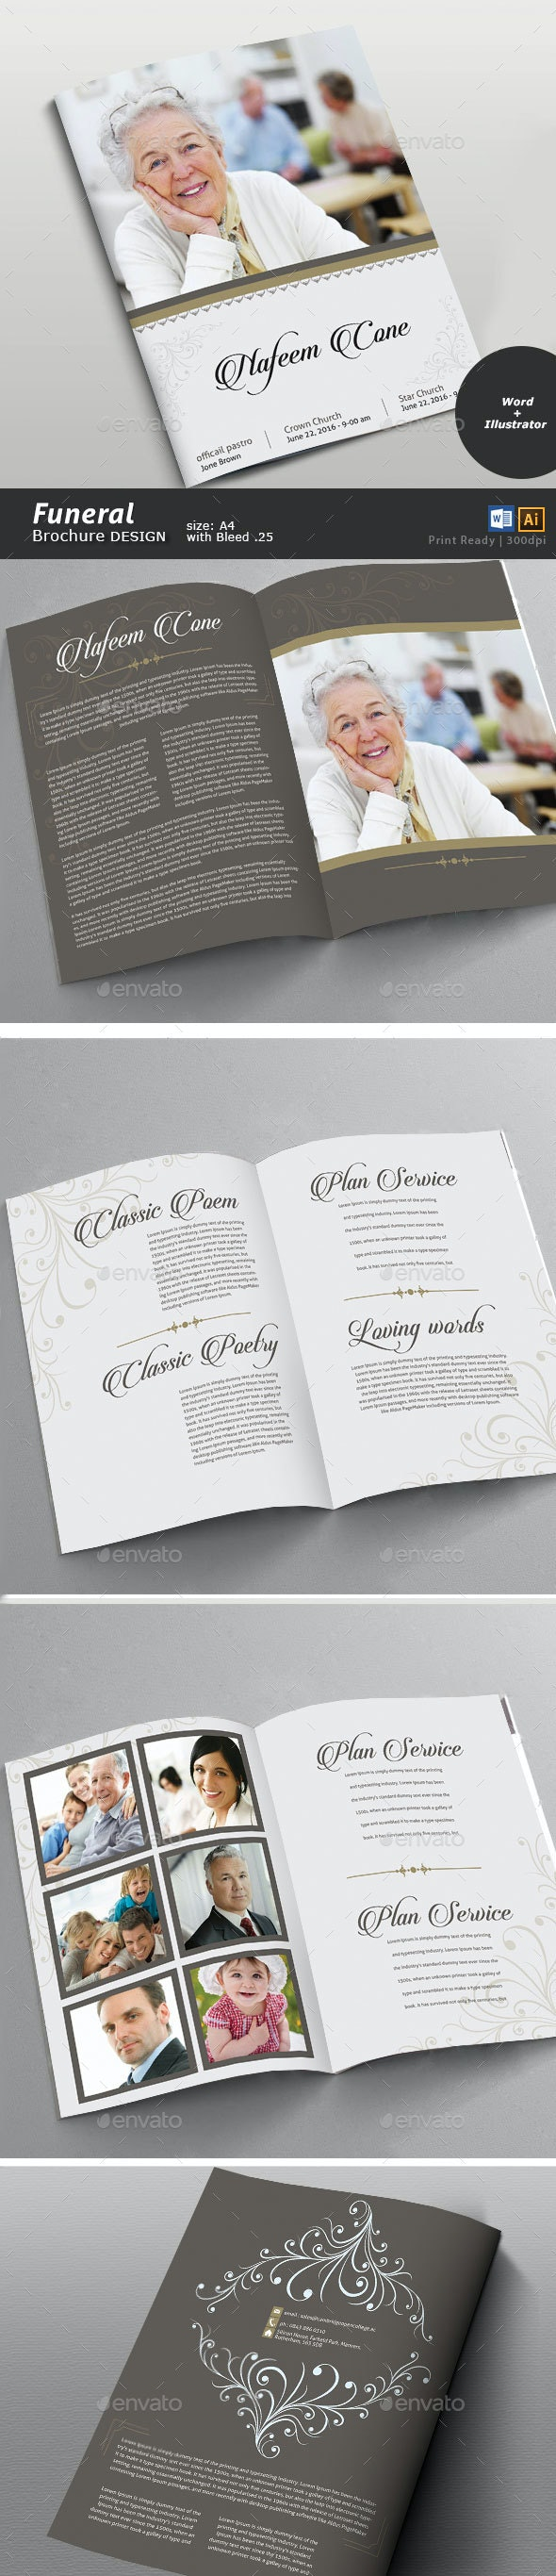 Funeral Brochure Design - Brochures Print Templates